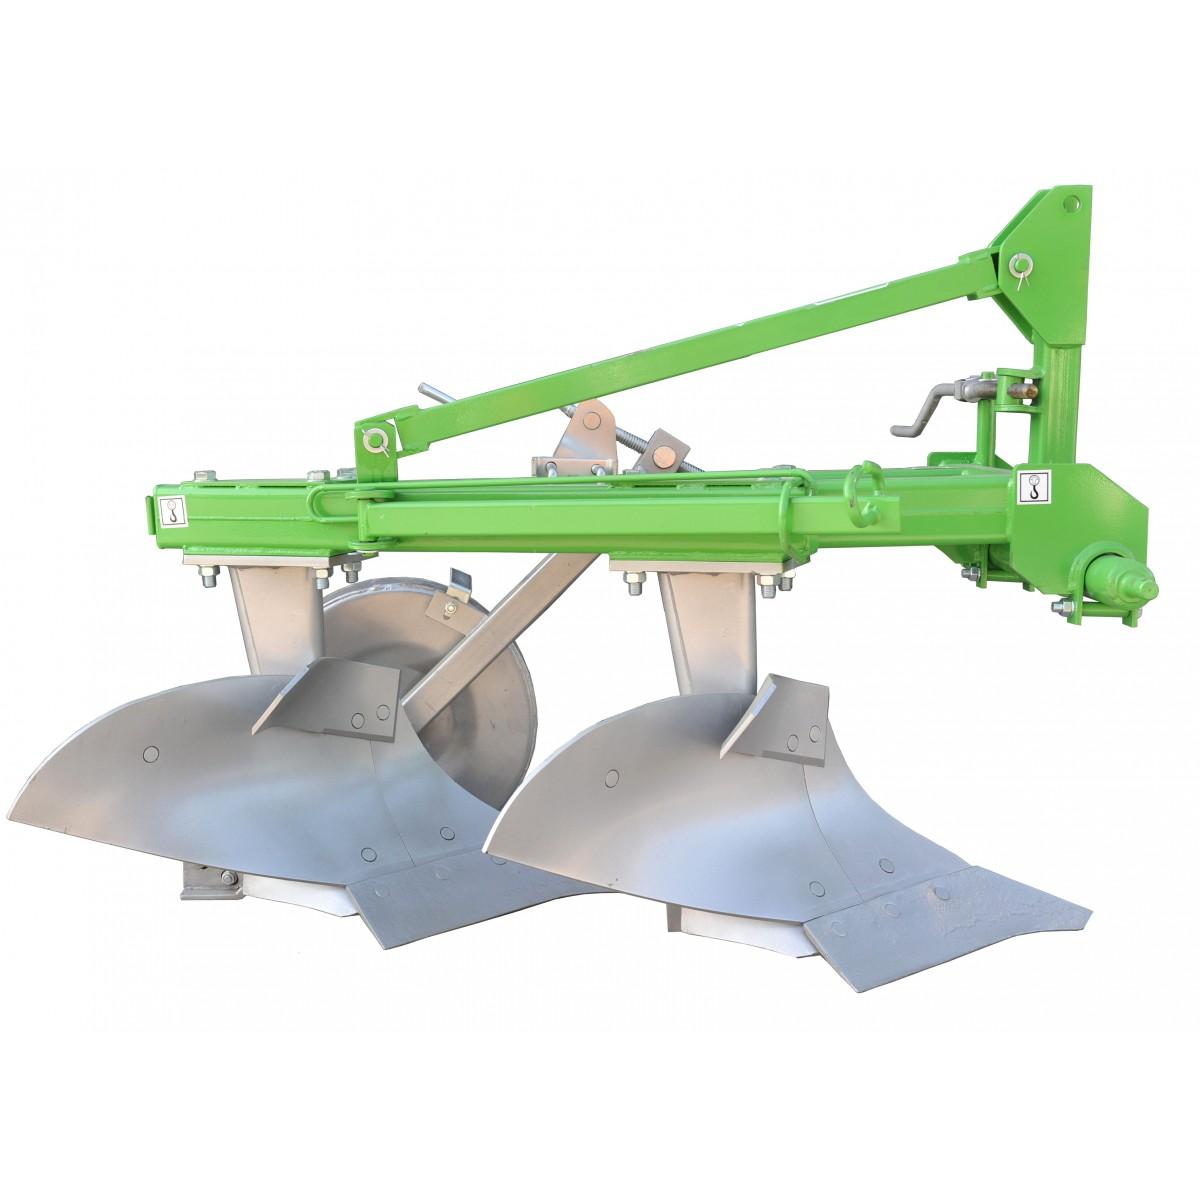 Double furrow plow BOMET on three-point linkage Cat II